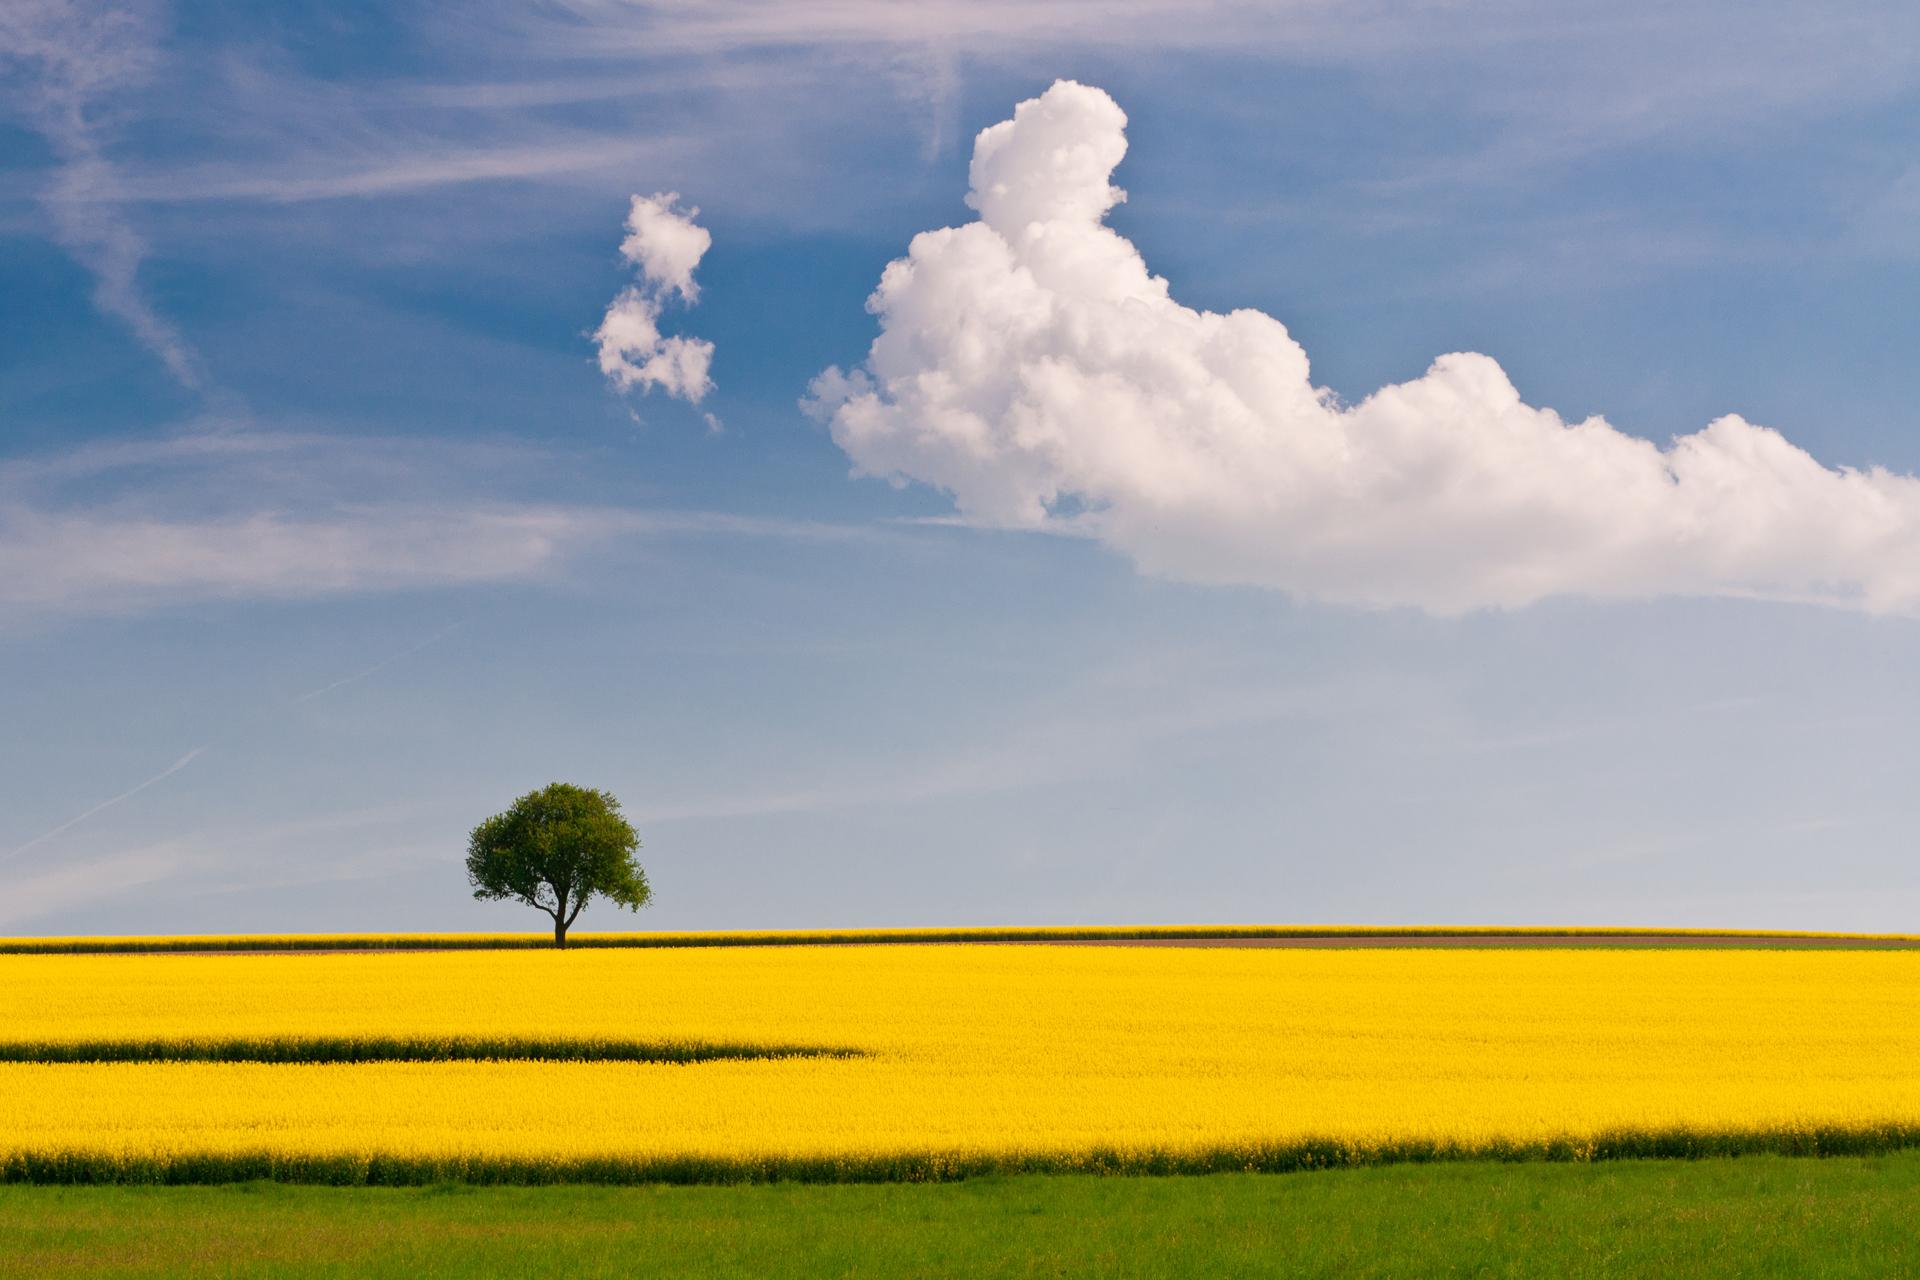 природа небо облака деревья поле nature the sky clouds trees field  № 243736 без смс